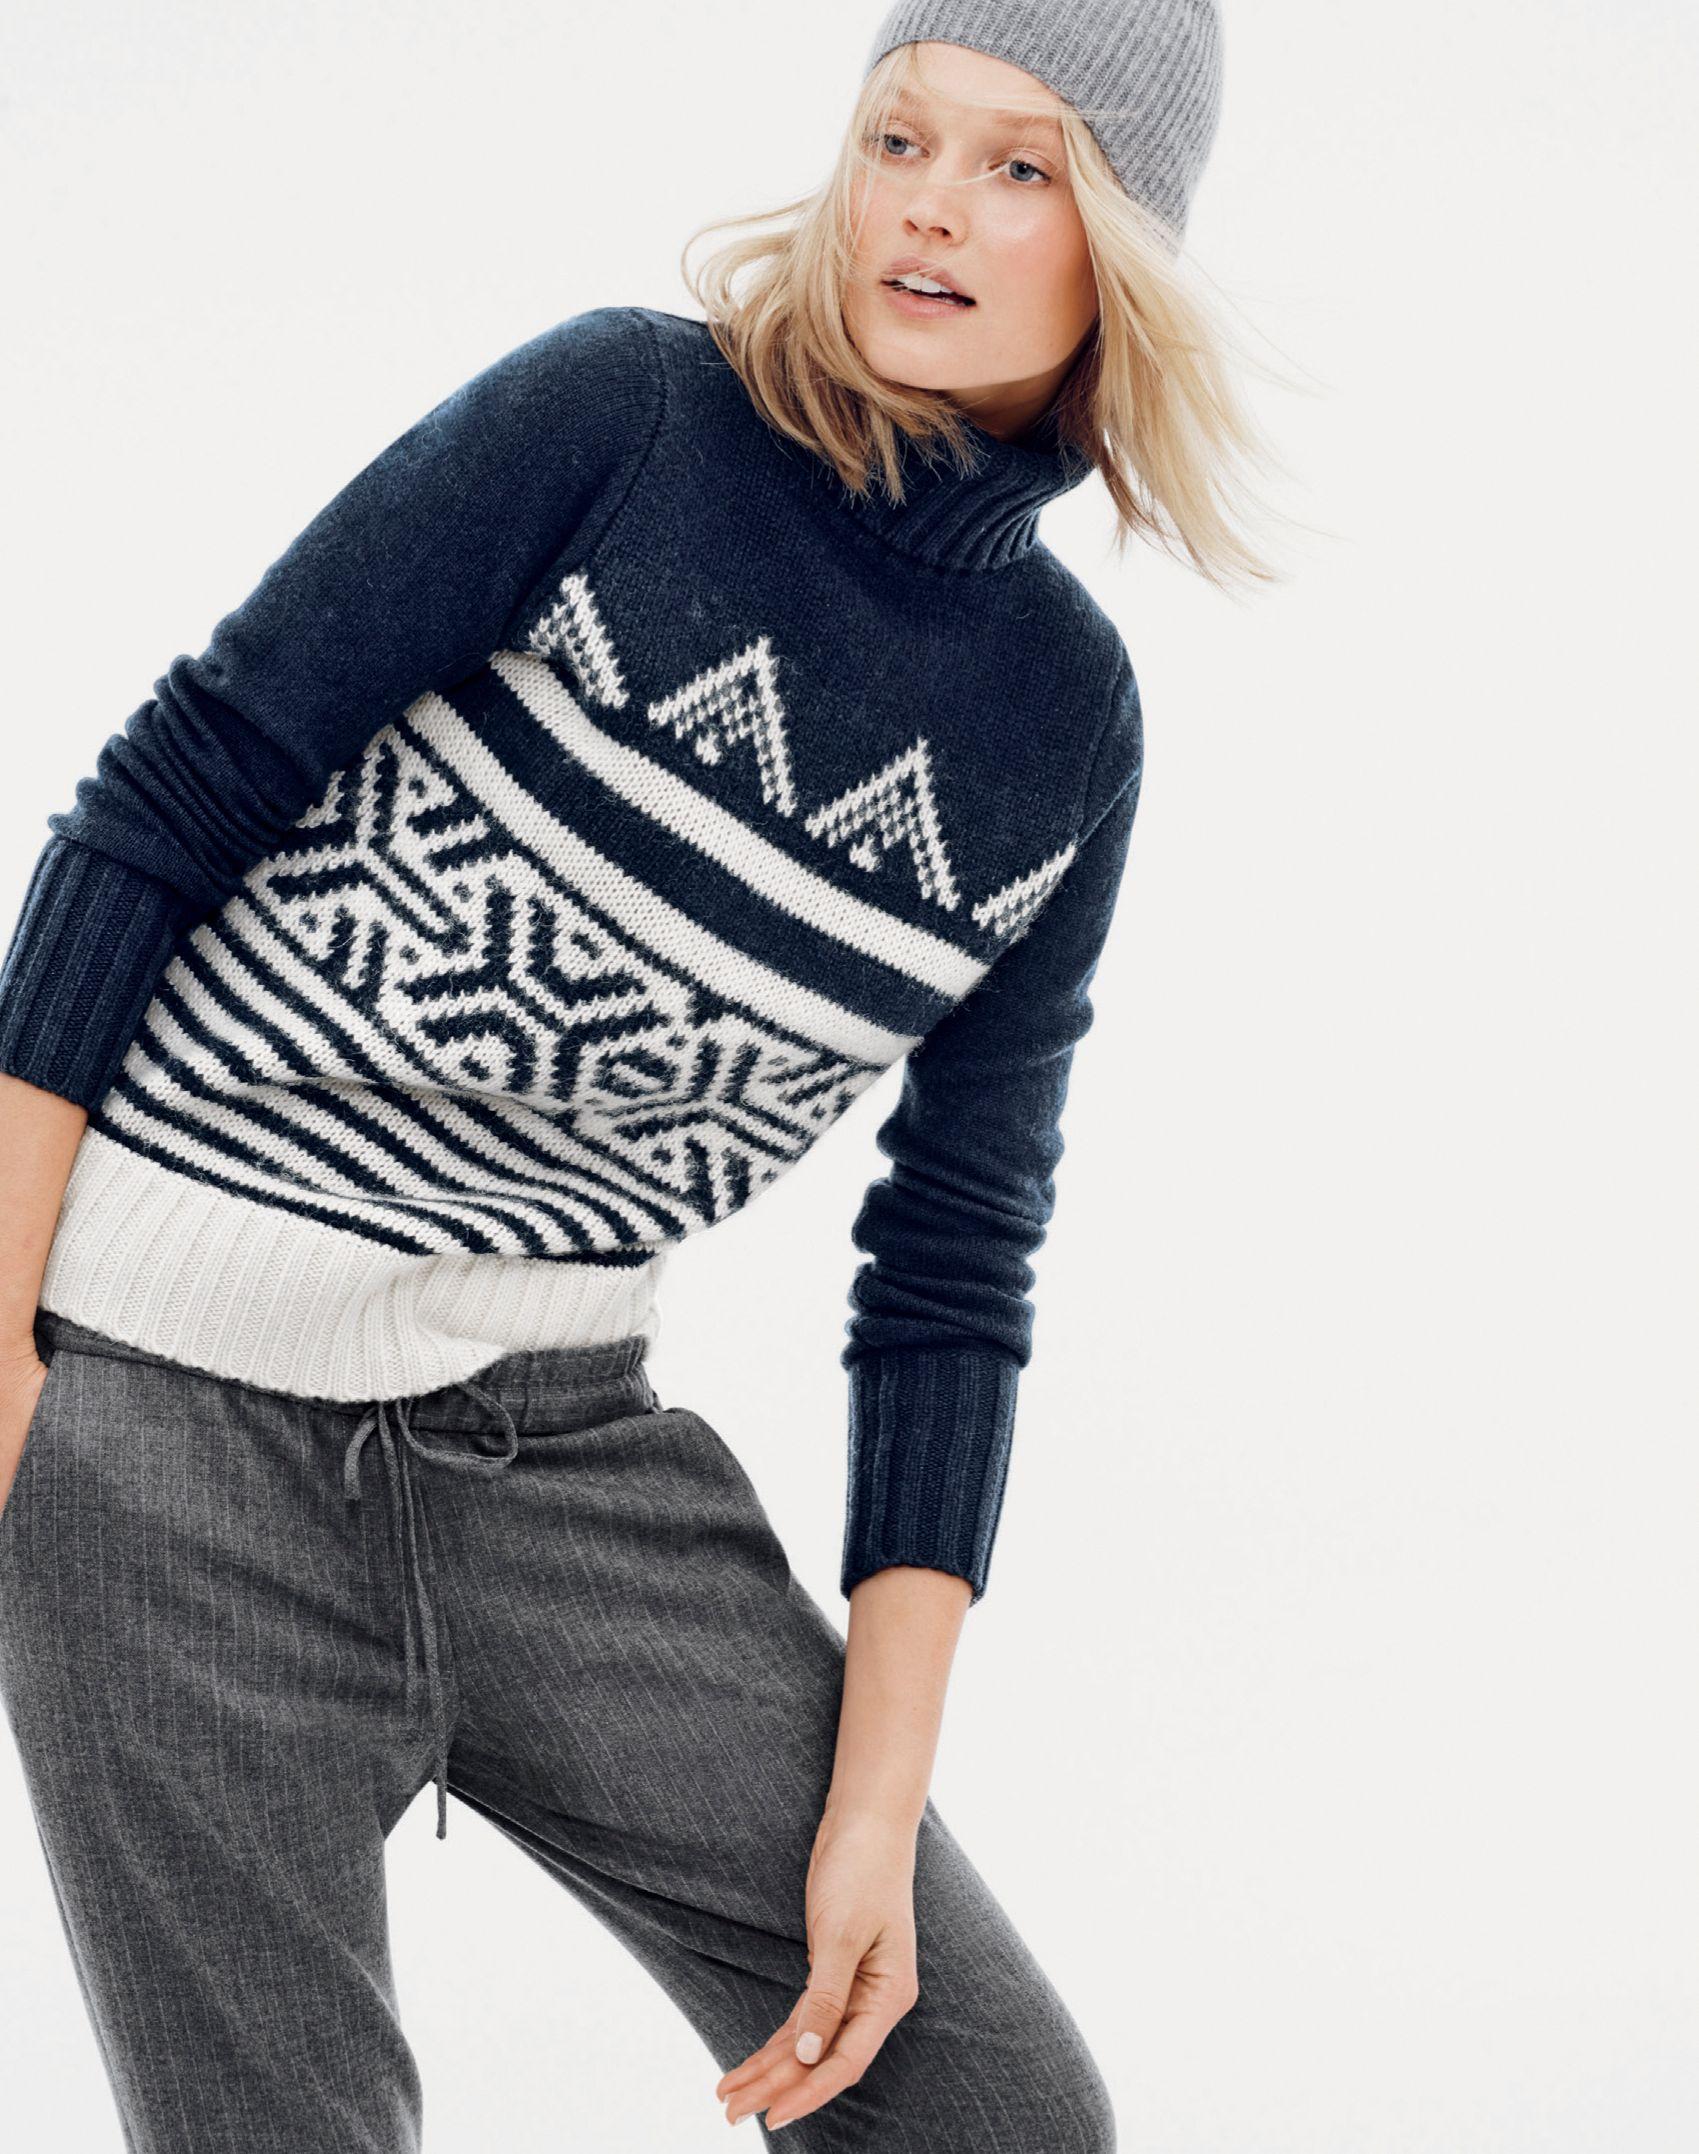 f85fc3396 J.Crew women's alpine turtleneck sweater, drapey sweatpant in ...